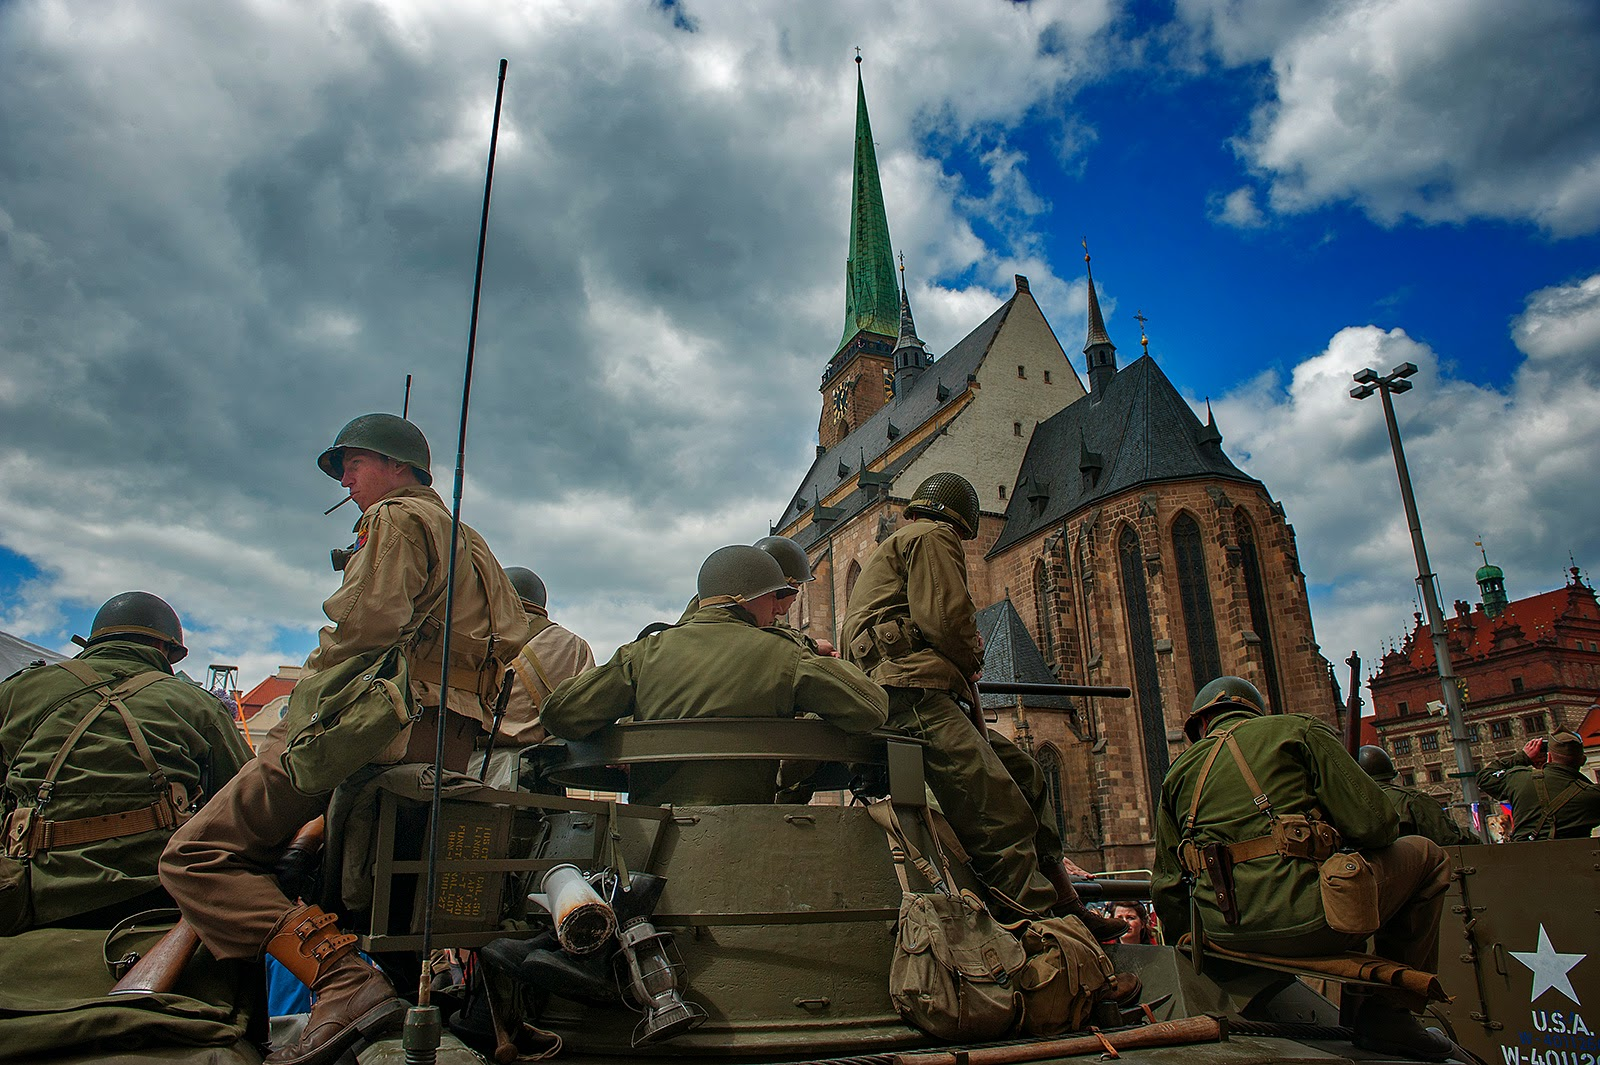 WWII, Plzen, World War II, U.S. WWII soldiers, 16 Armored Division, Liberation of Plzen, Czech Republic, Czechoslovakia